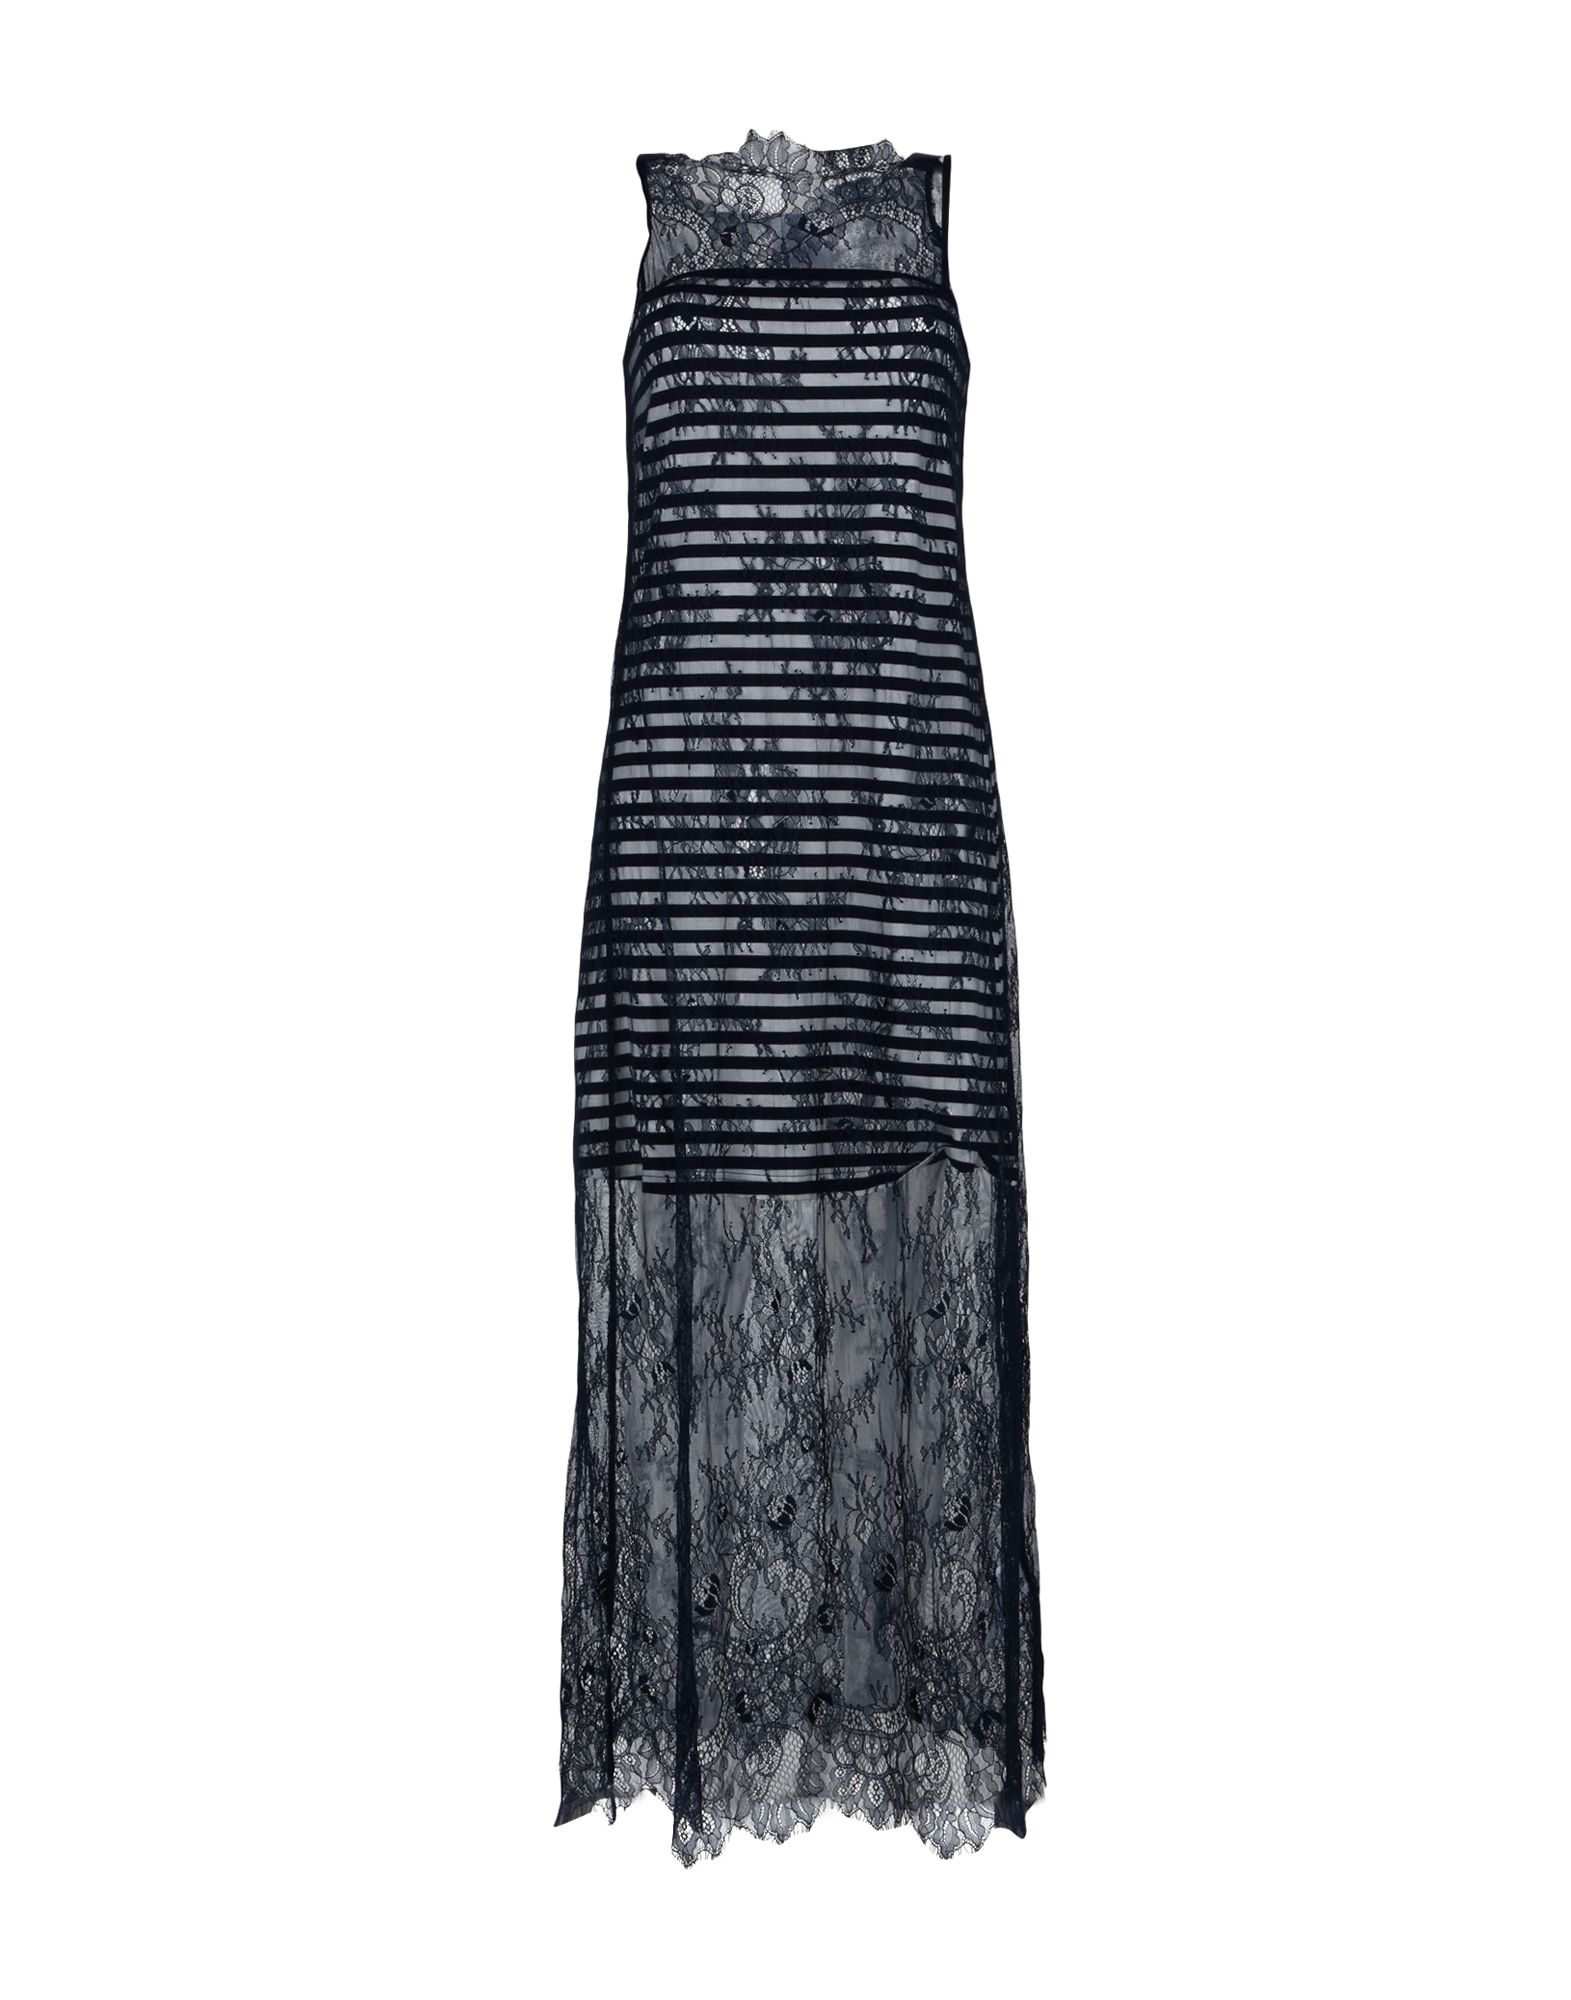 TI CHIC Milano Платье длиной 3/4 платье chic chic ch042ewtcv81 page 3